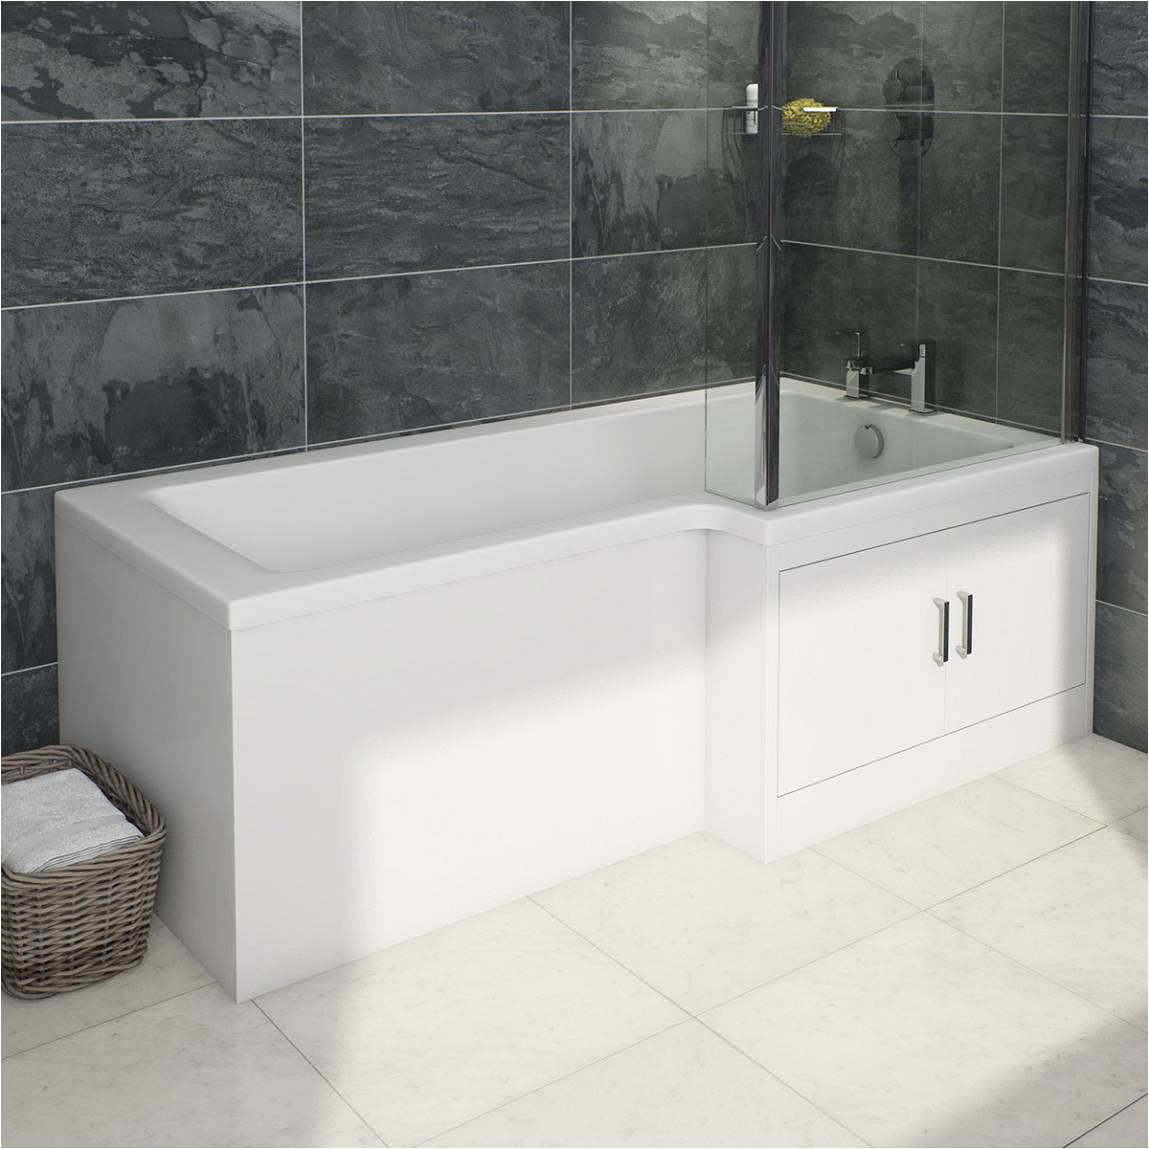 Bathtub Liner Water Storage Myspace Water Saving L Shape Shower Bath Right Hand with